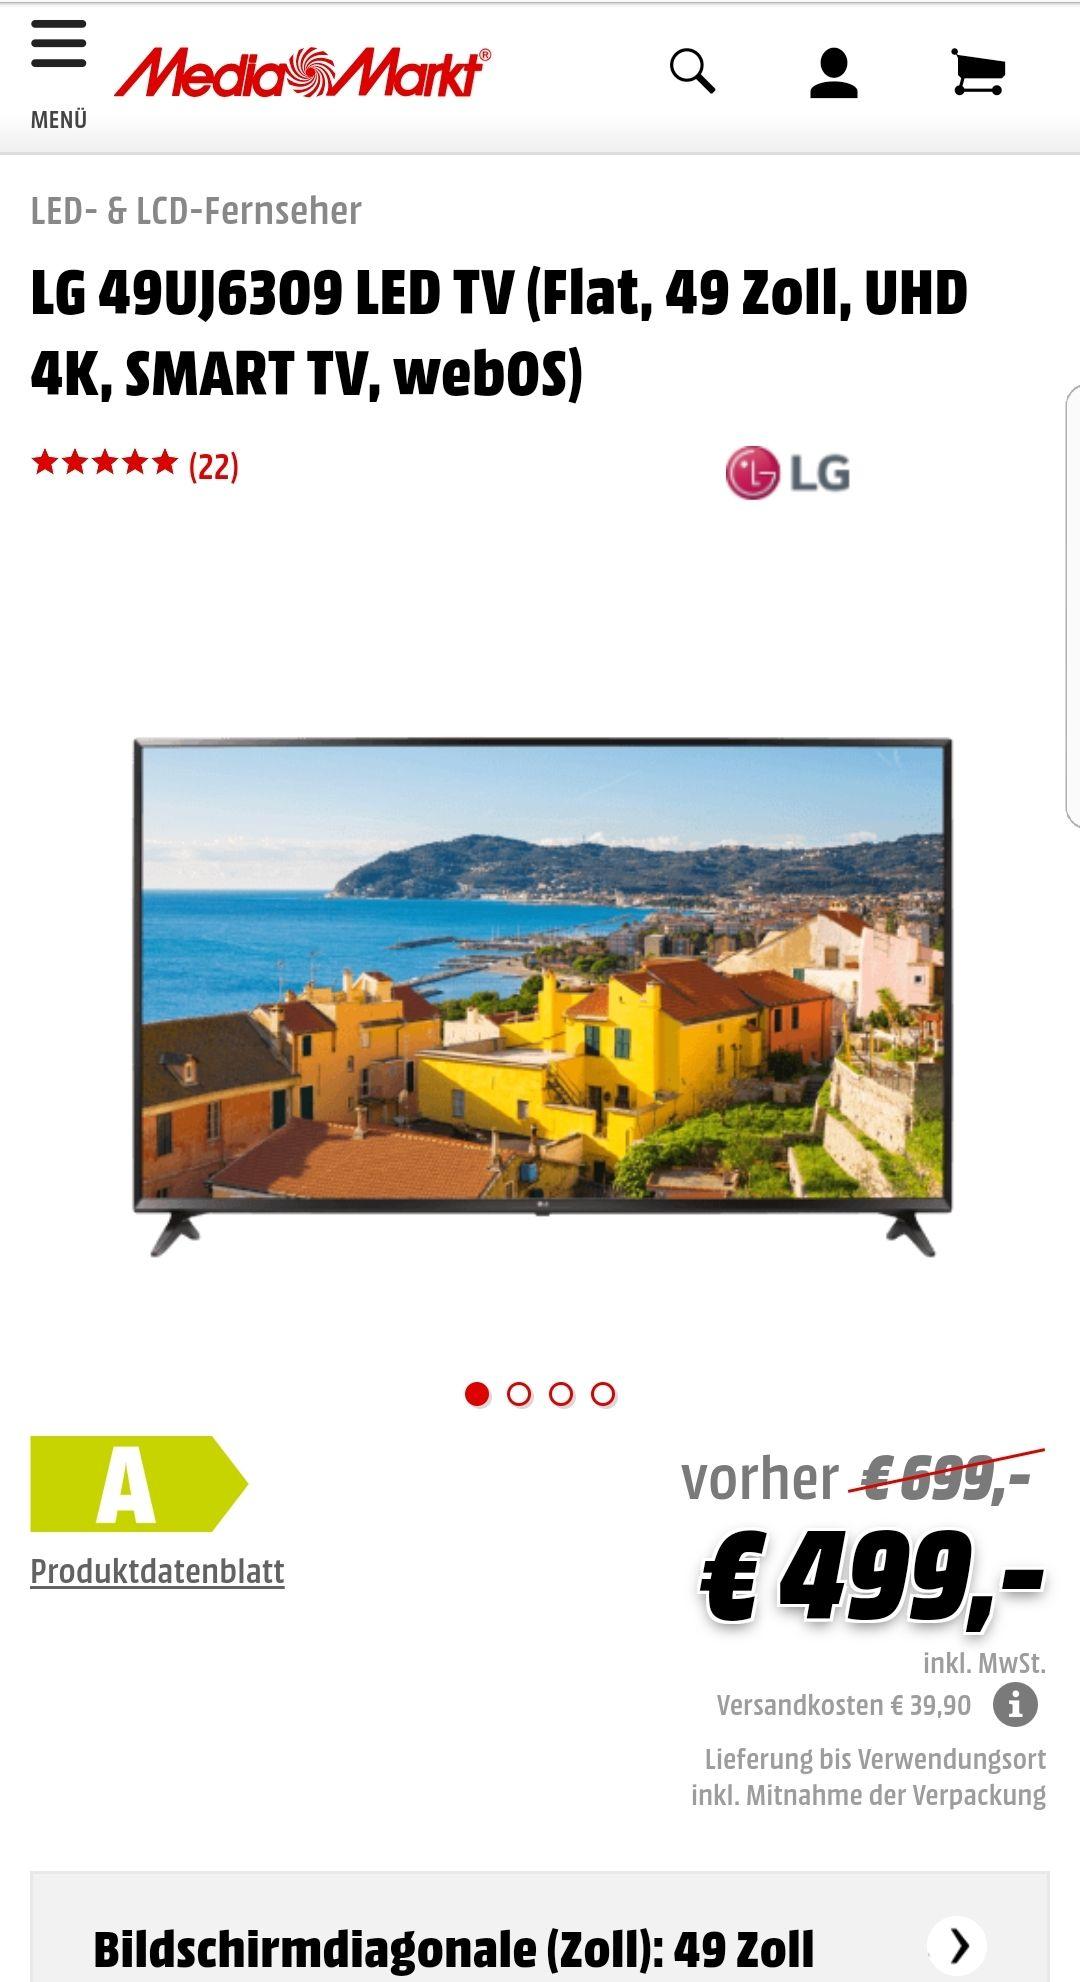 *Media-Markt* LG 49UJ6309 LED TV (Flat, 49 Zoll, UHD 4K, SMART TV, webOS) mit HDR 10 (8 Bit + FCR)